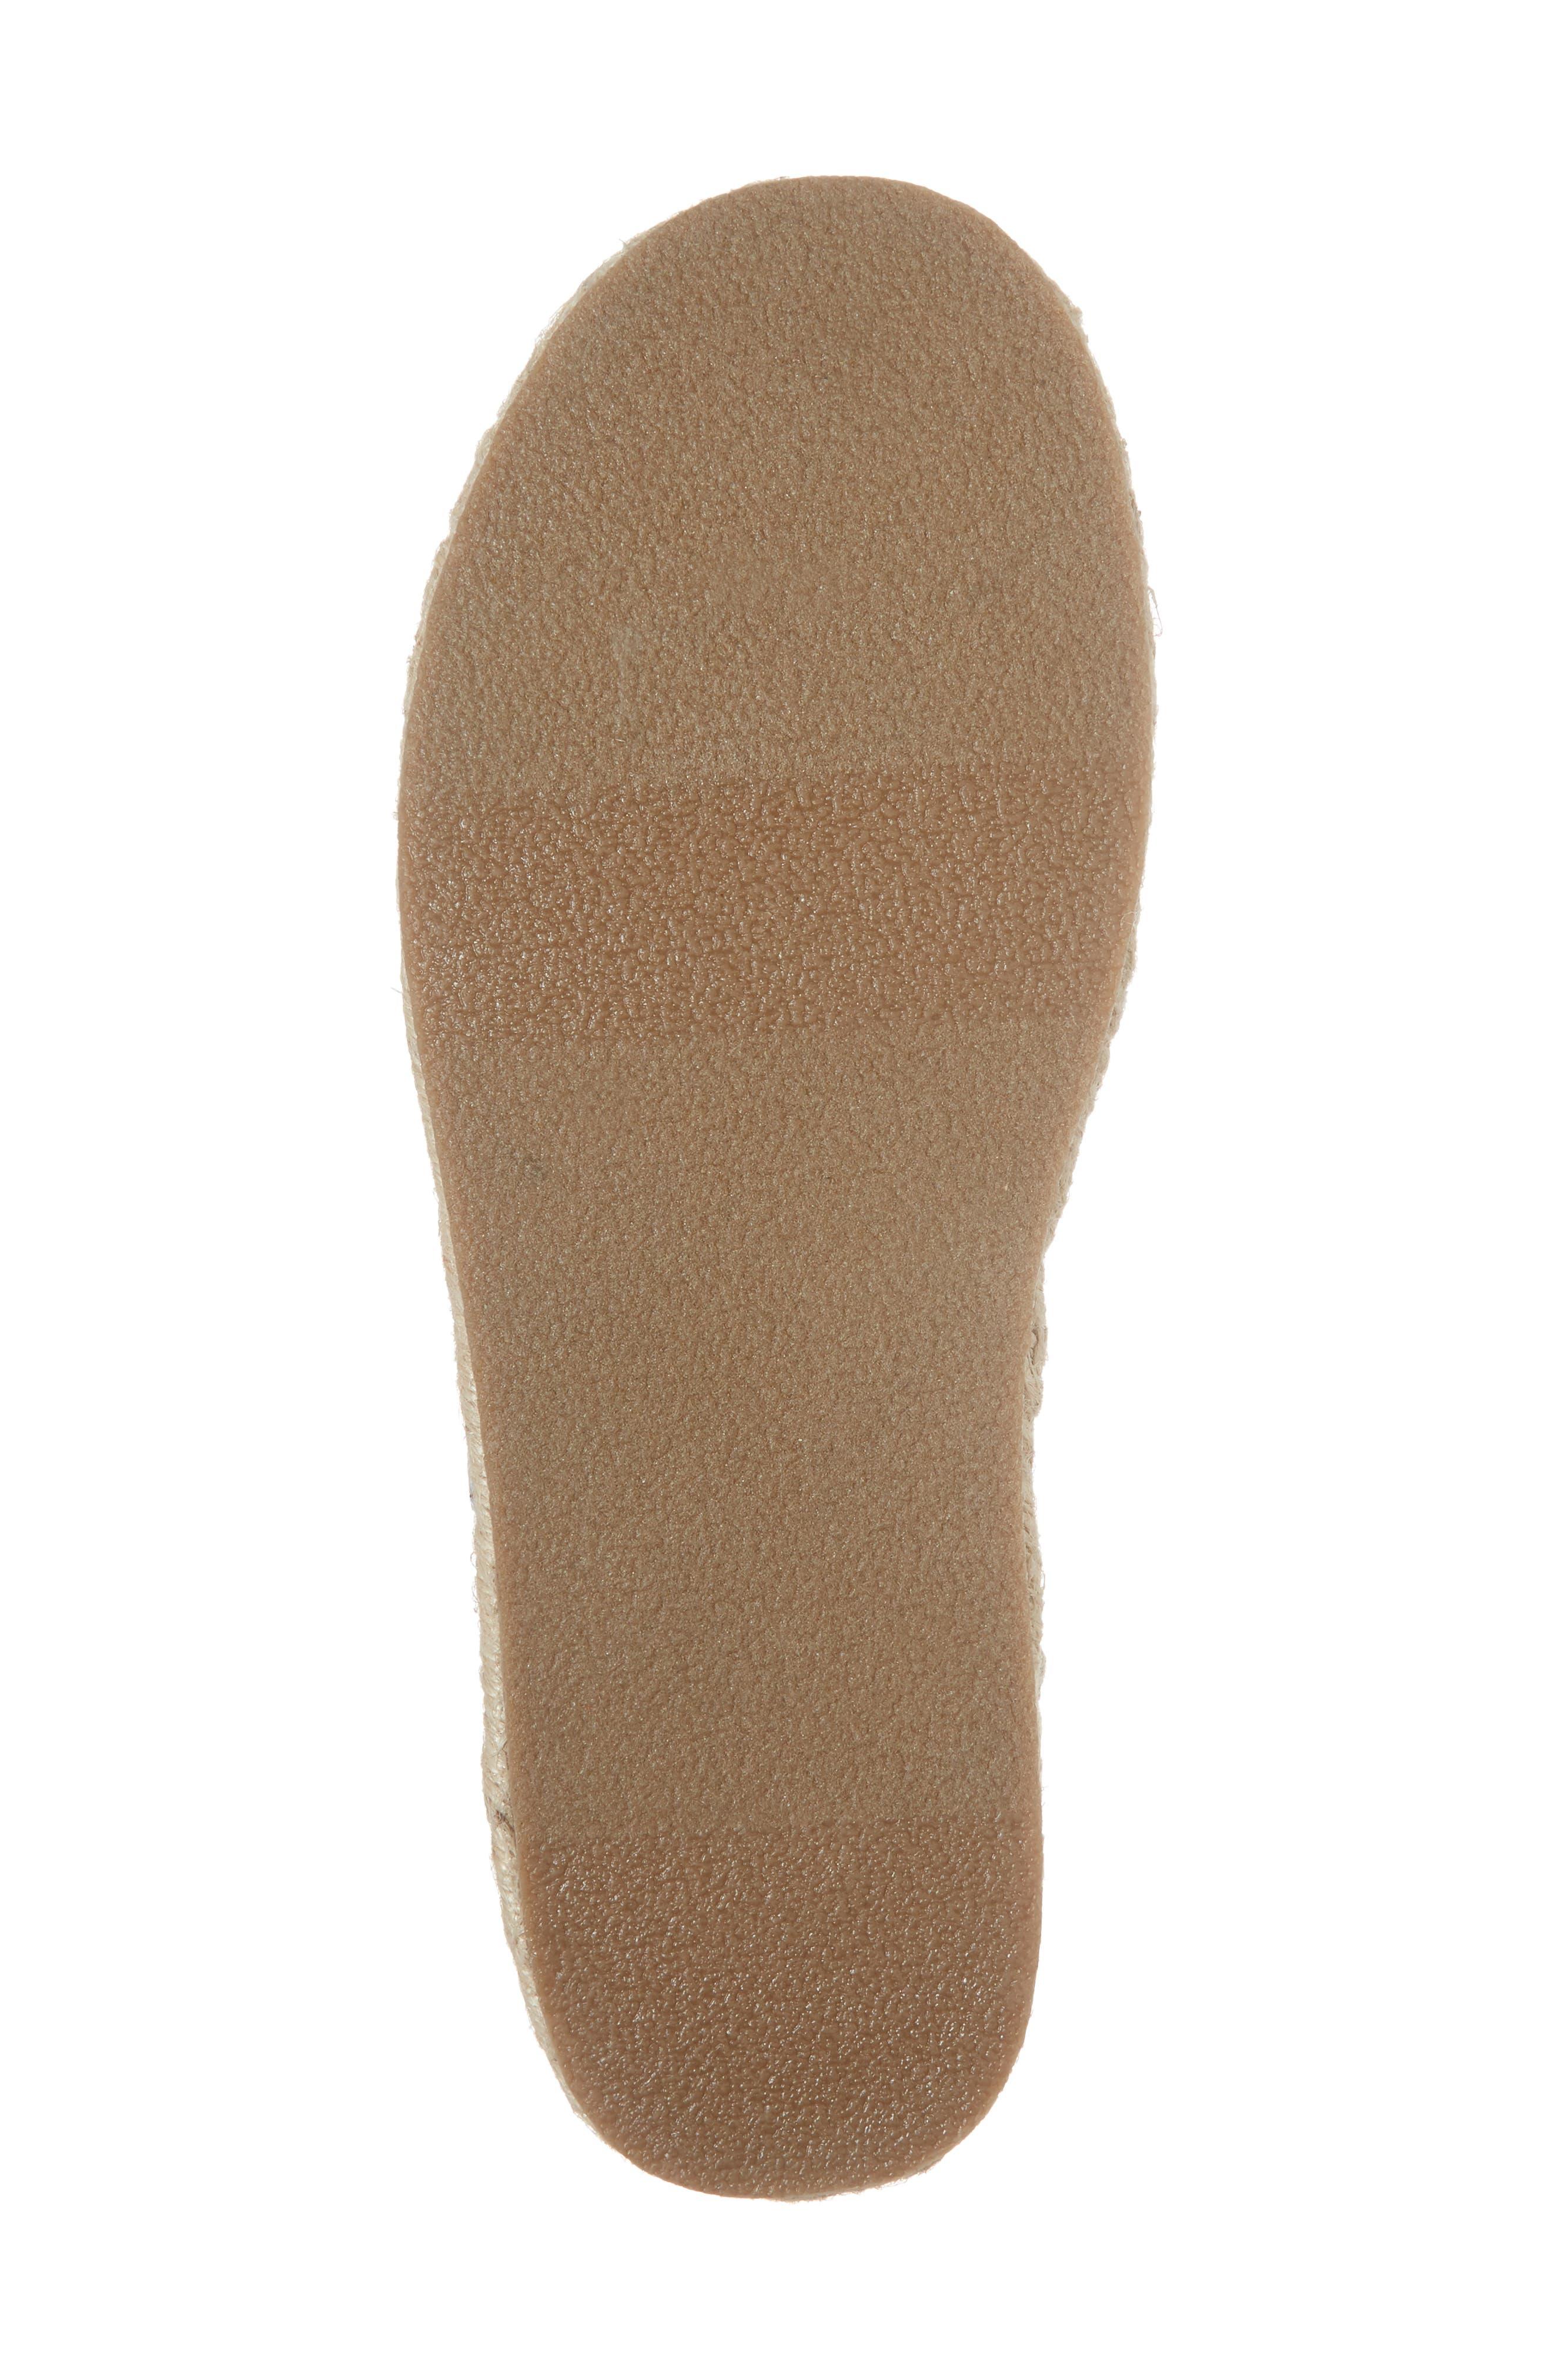 JLUAO Tropical Embellished Sandal,                             Alternate thumbnail 6, color,                             Fruit Multi